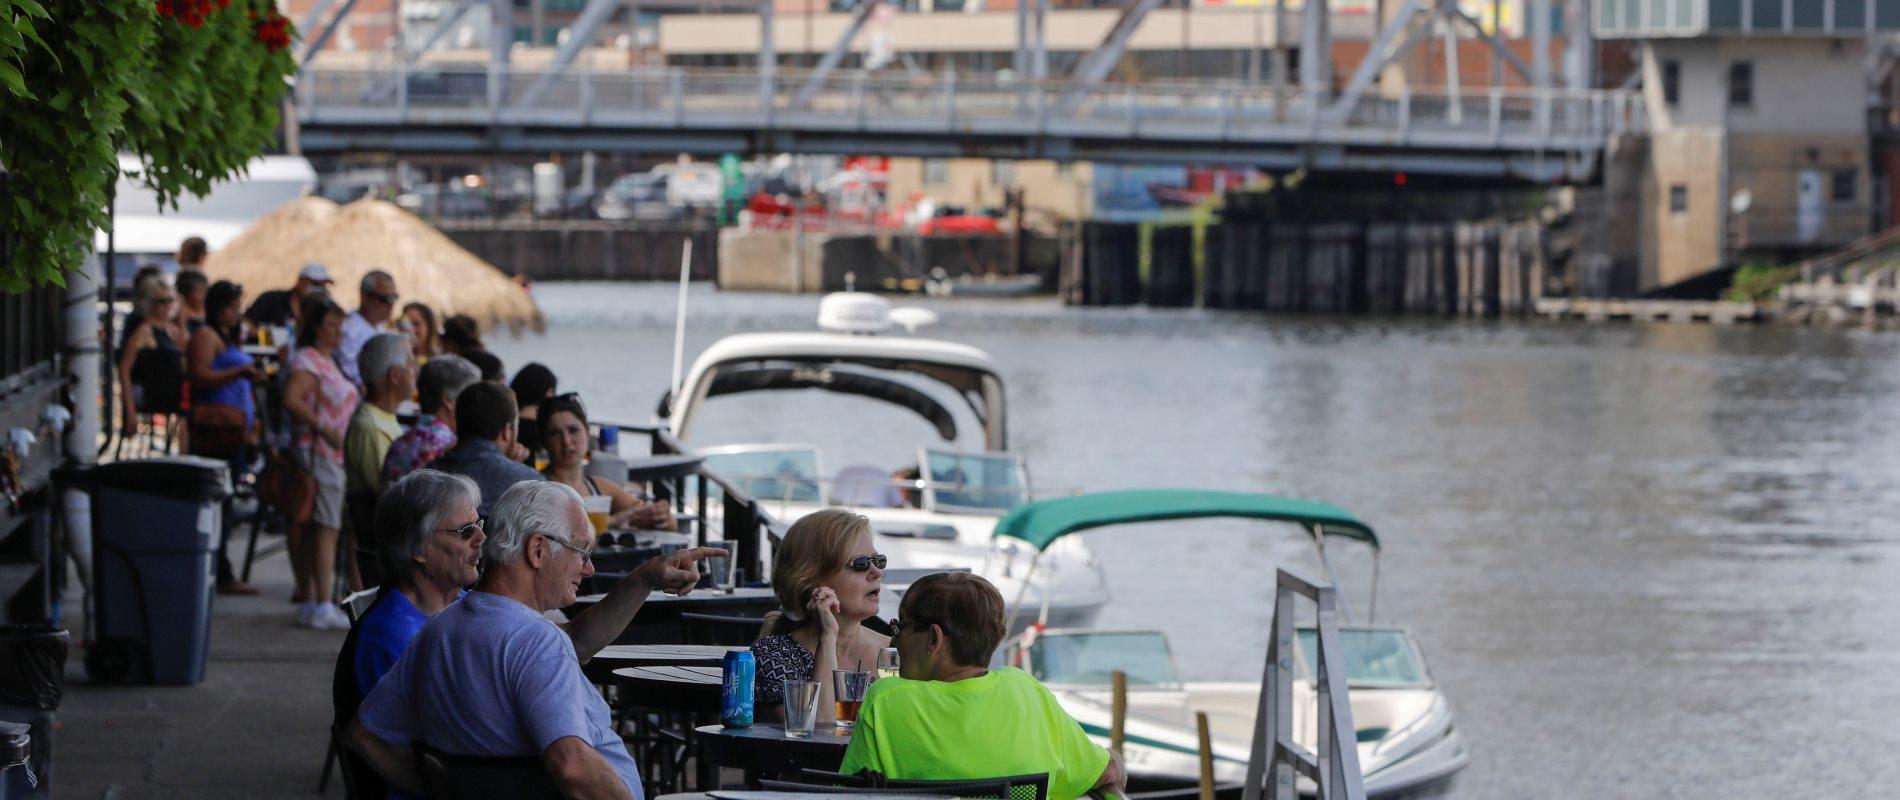 Diners enjoy the patio lining the Buffalo River at Buffalo RiverWorks. (Derek Gee/Buffalo News)